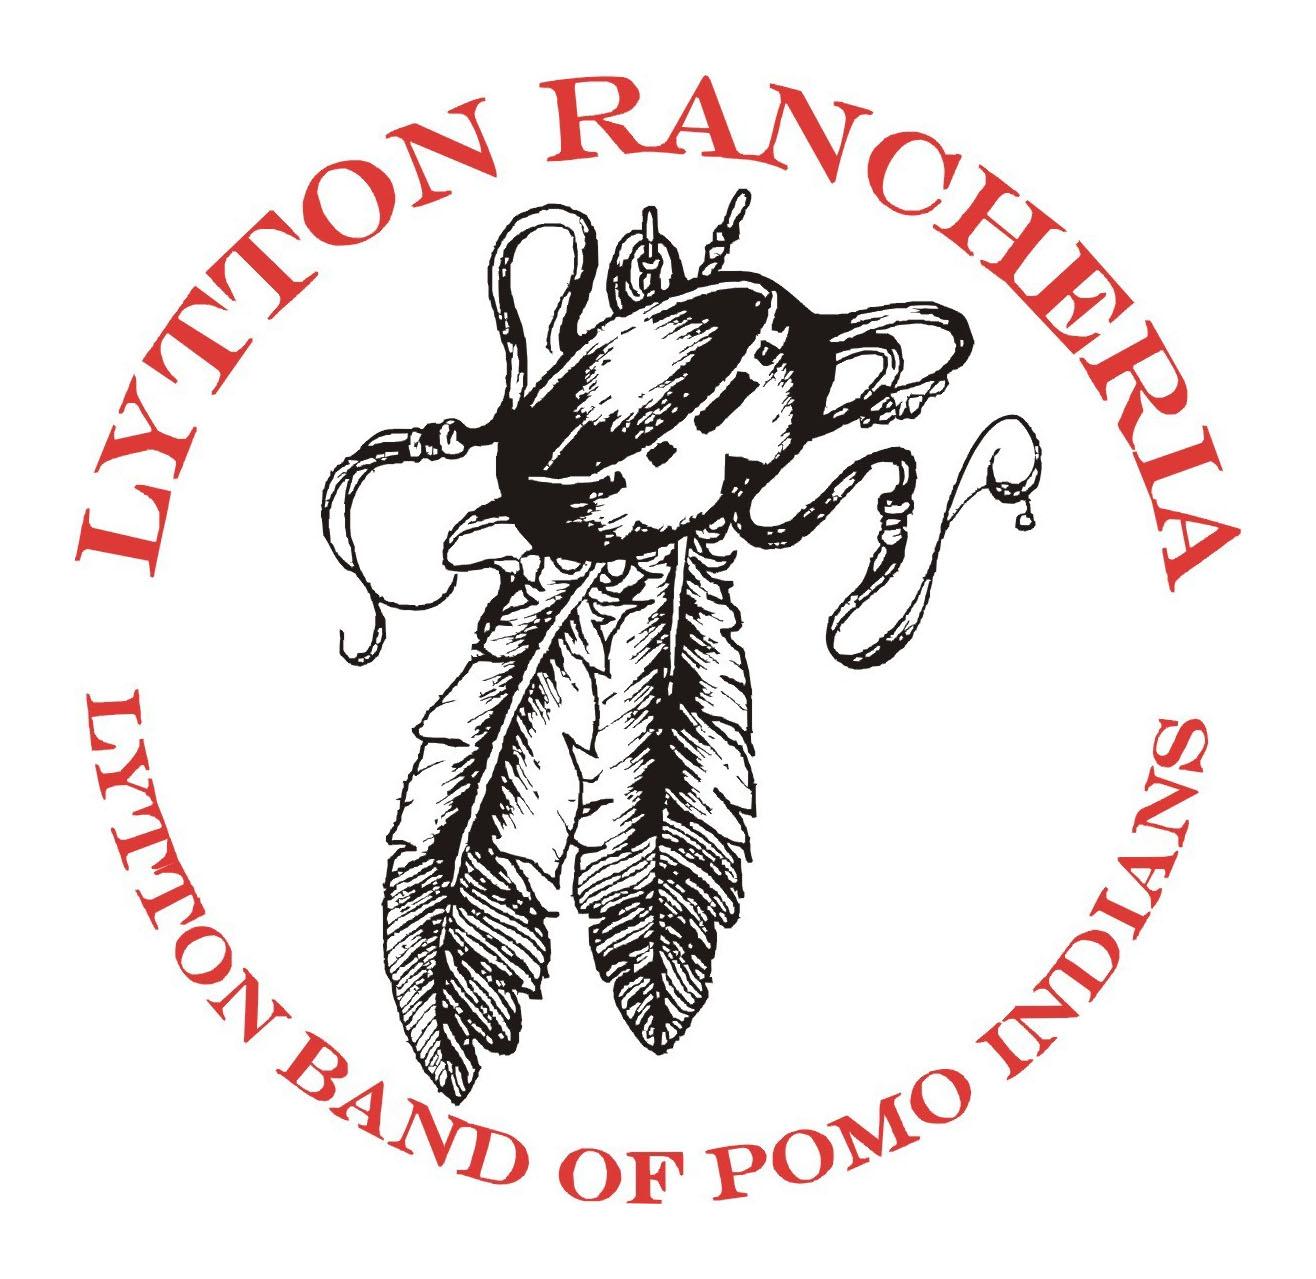 Lytton Rancheria